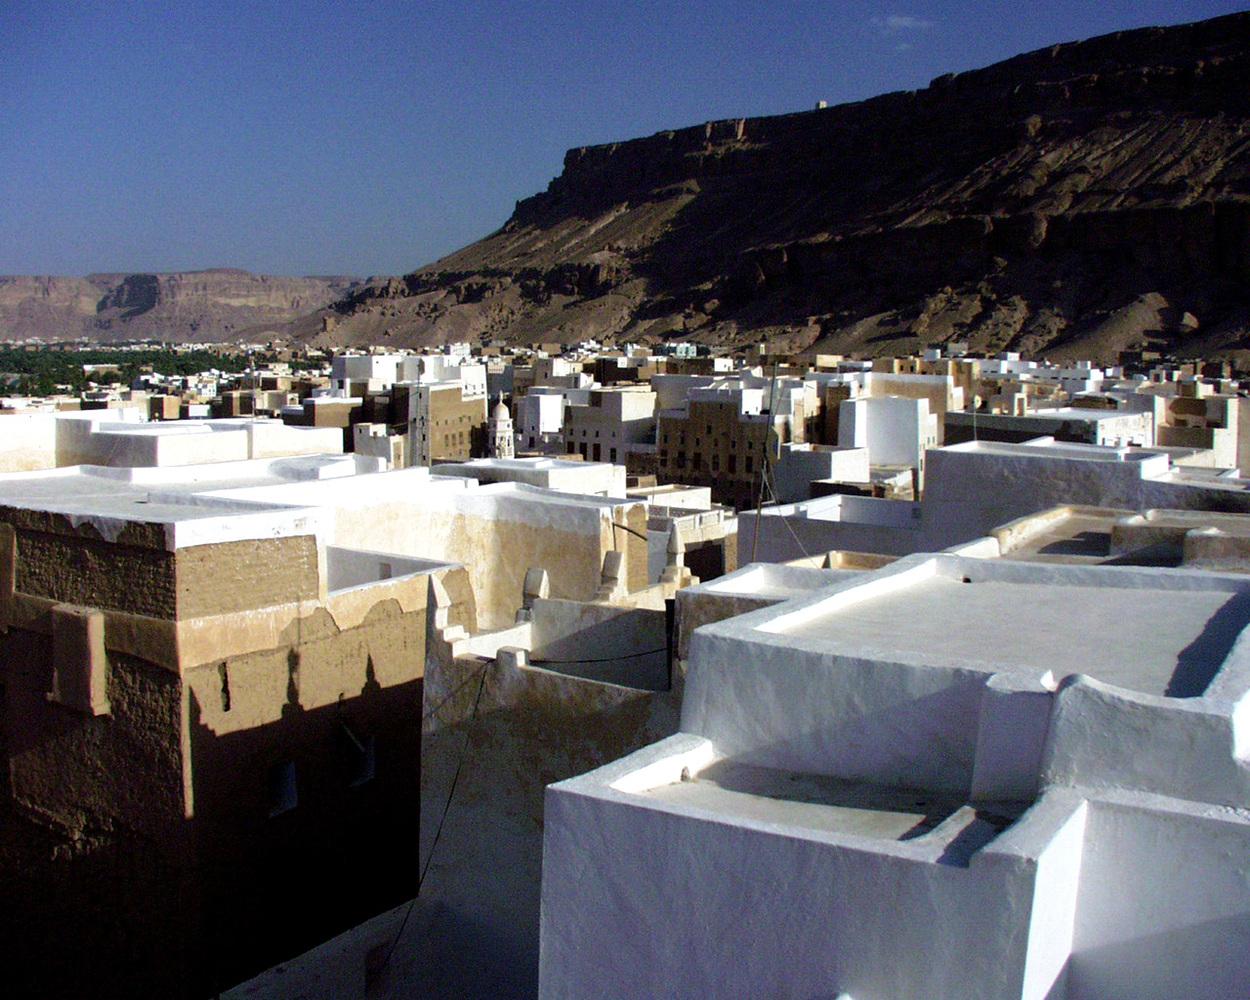 The 'Manhattan of the Desert': Shibam, Yemen's Ancient Skyscraper City,Shibam rooftops. Image © Flickr CC user maartenF